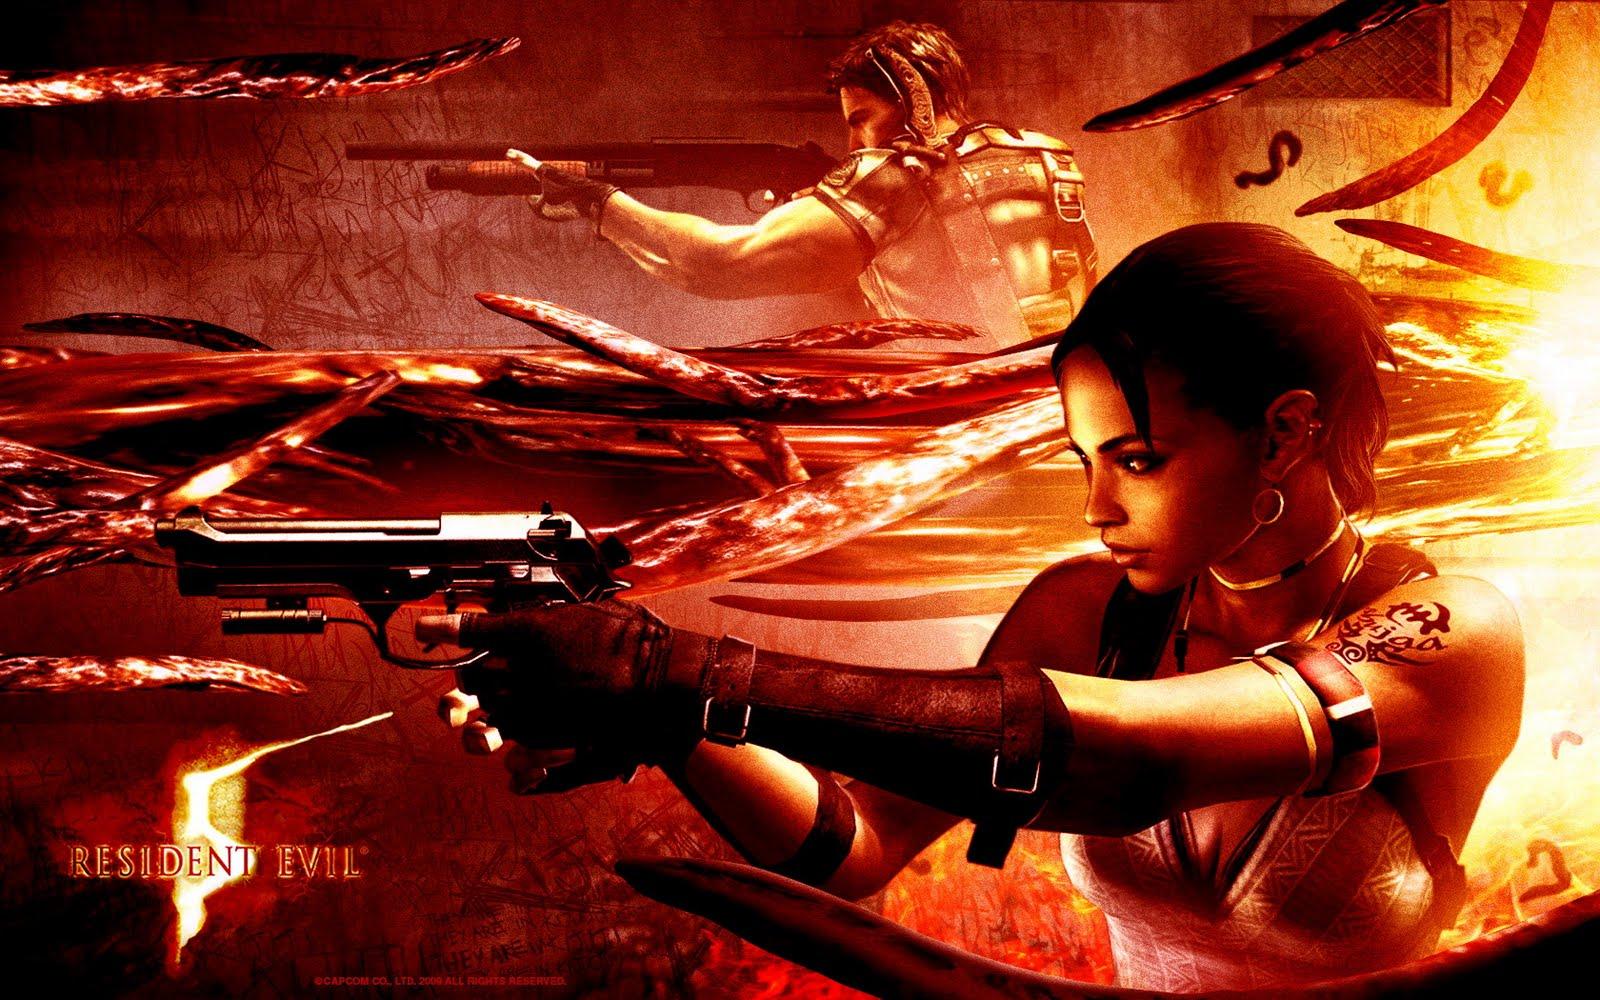 Free Download Resident Evil 5 Wallpapers 1 Wallpaper Animal Hd